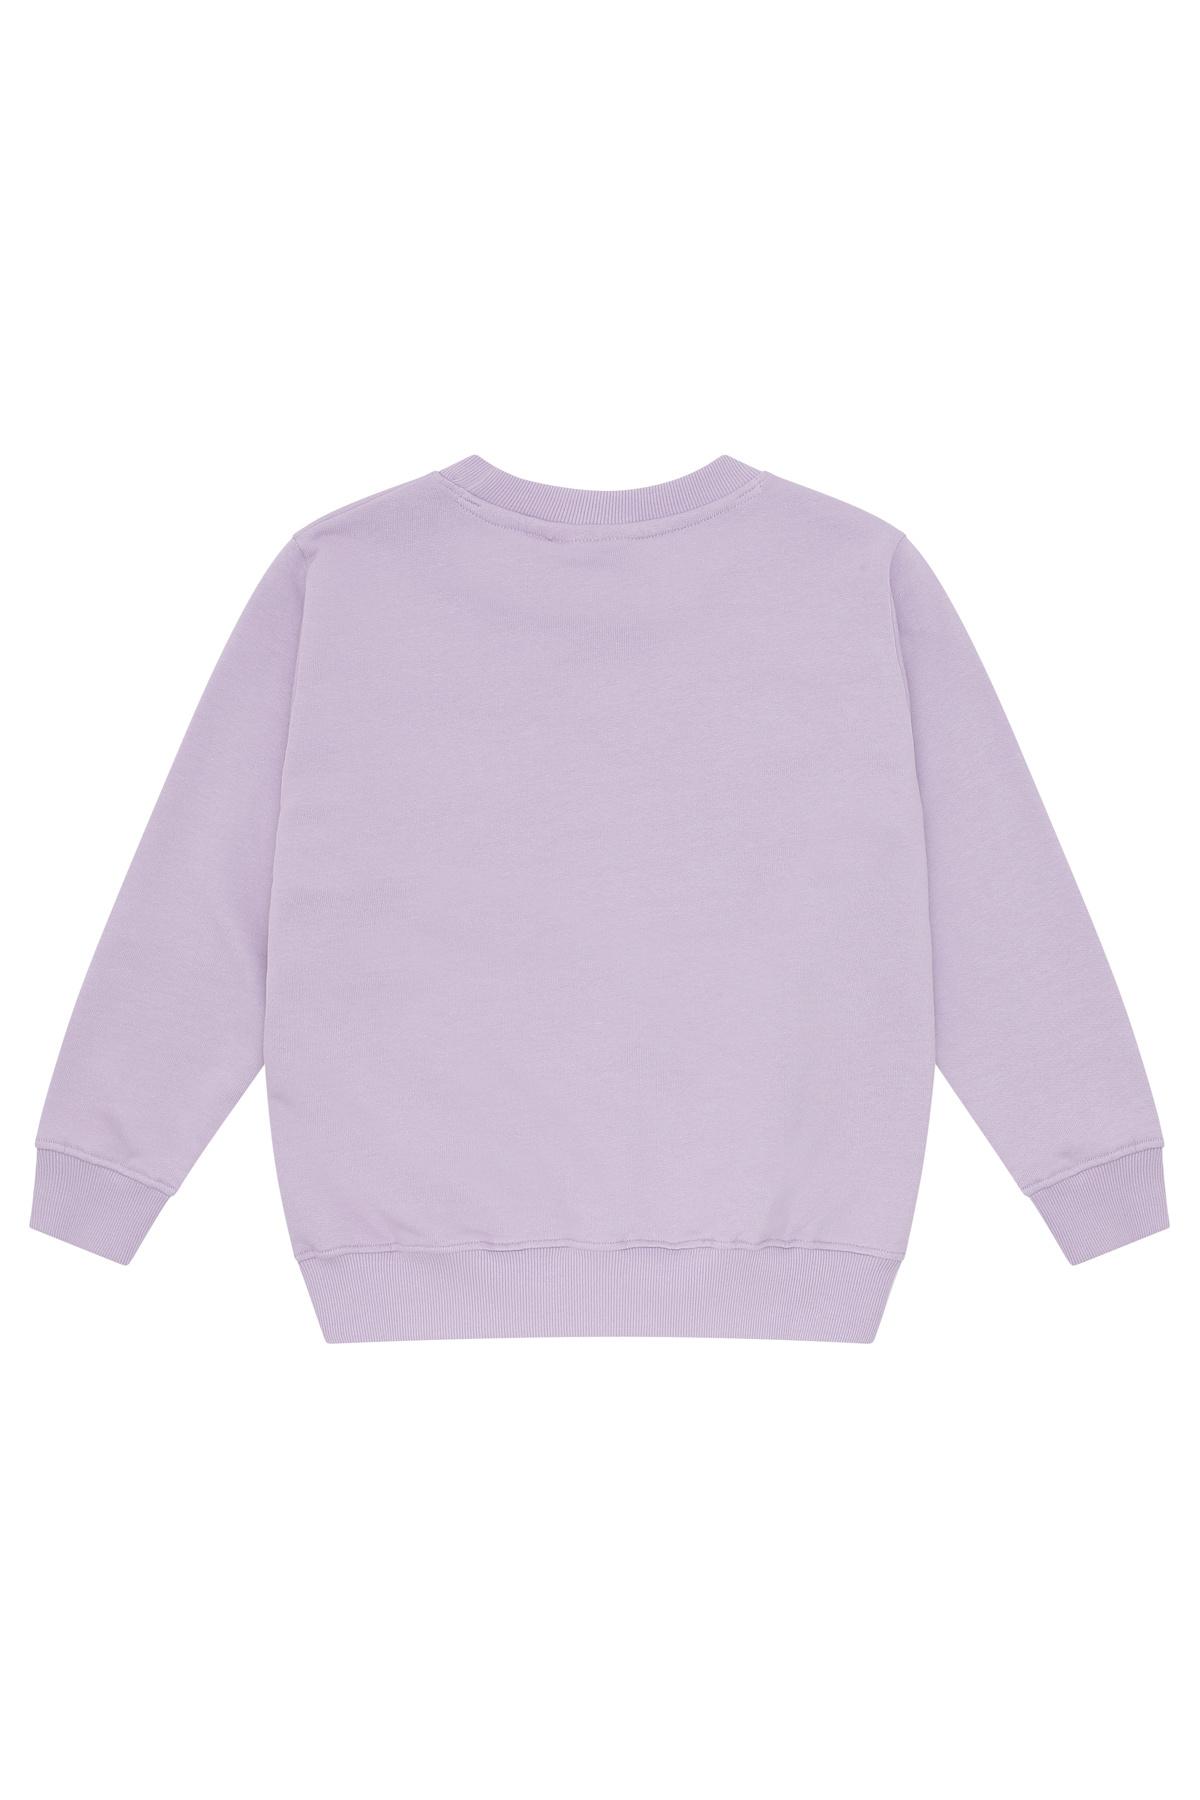 Baptiste sweatshirt - Lavender Frost-3